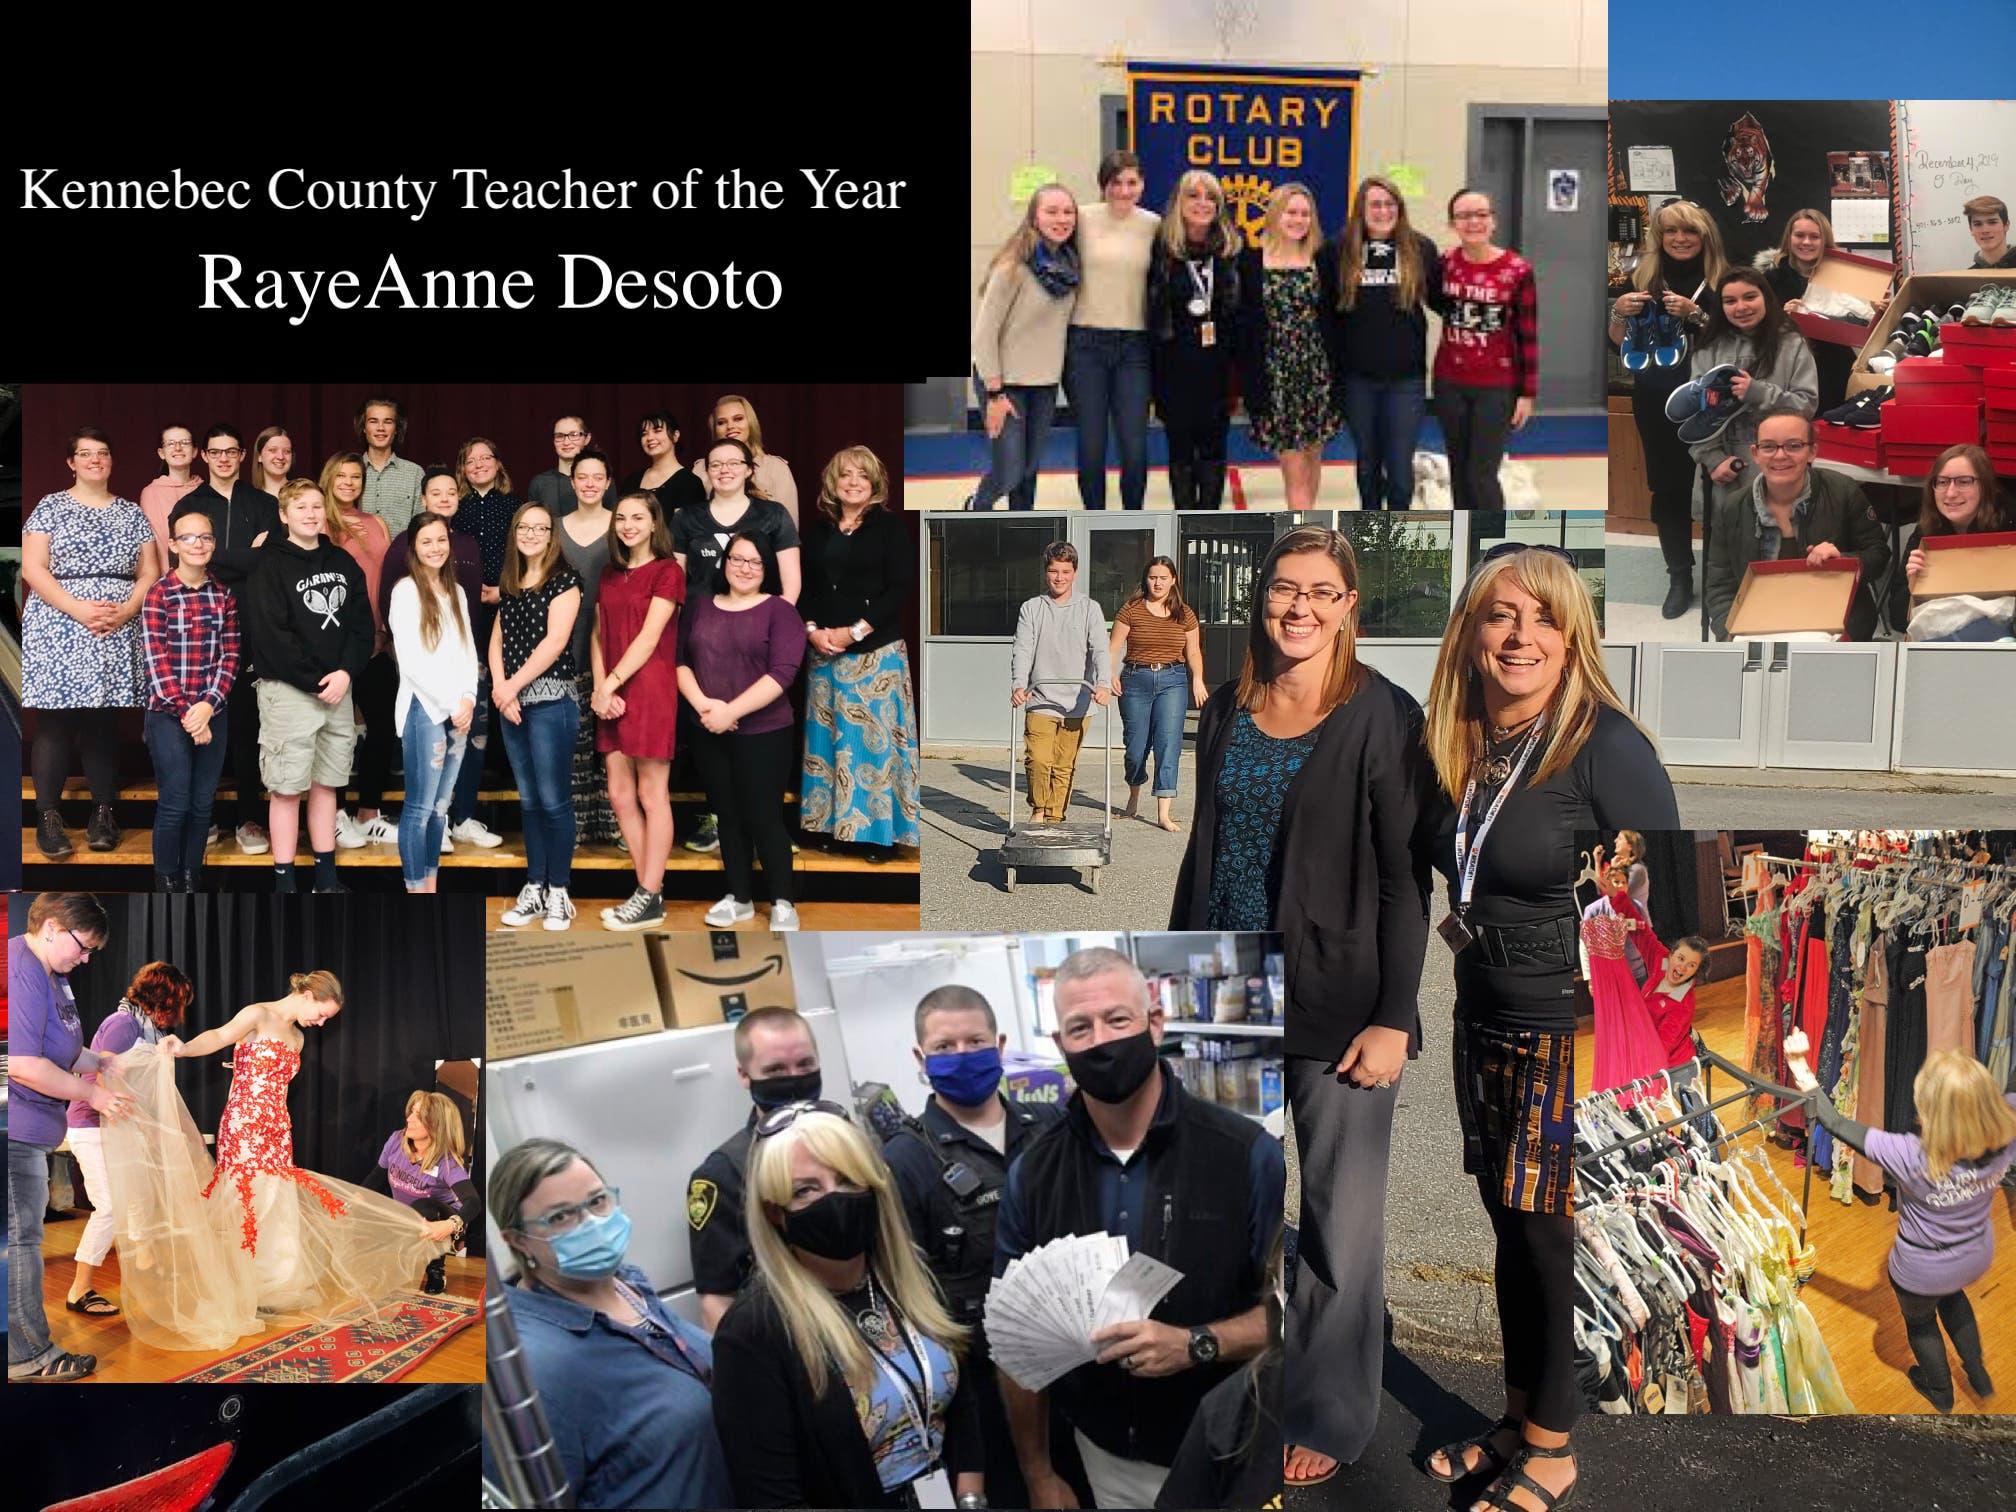 RayeAnne Desoto - Kennebec County Teacher of the Year!